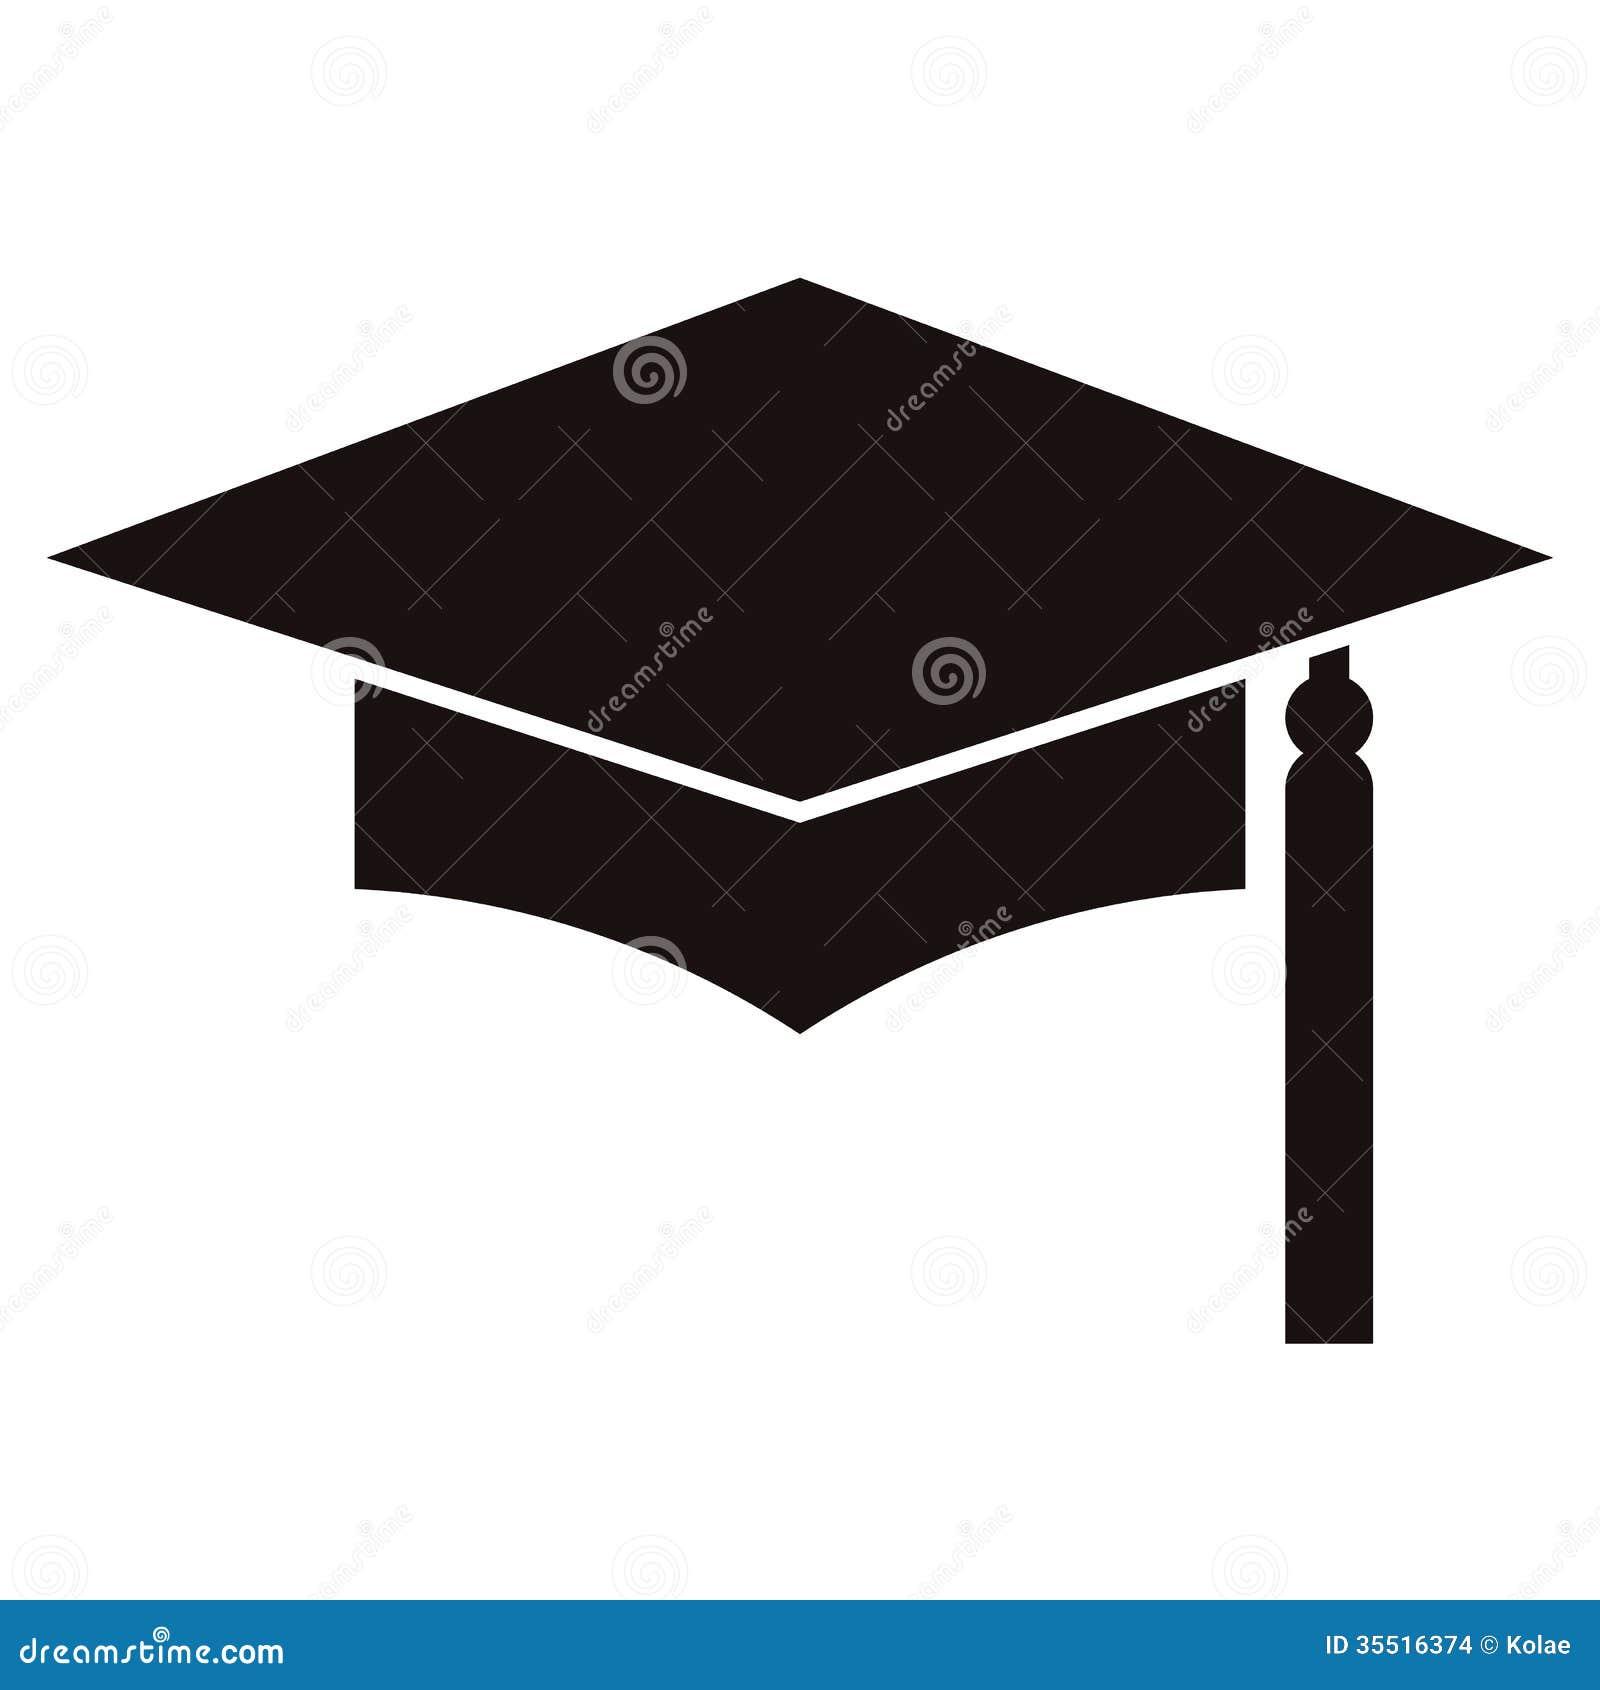 Mortar Board Or Graduation Cap, Education Symbol Stock Images - Image ...